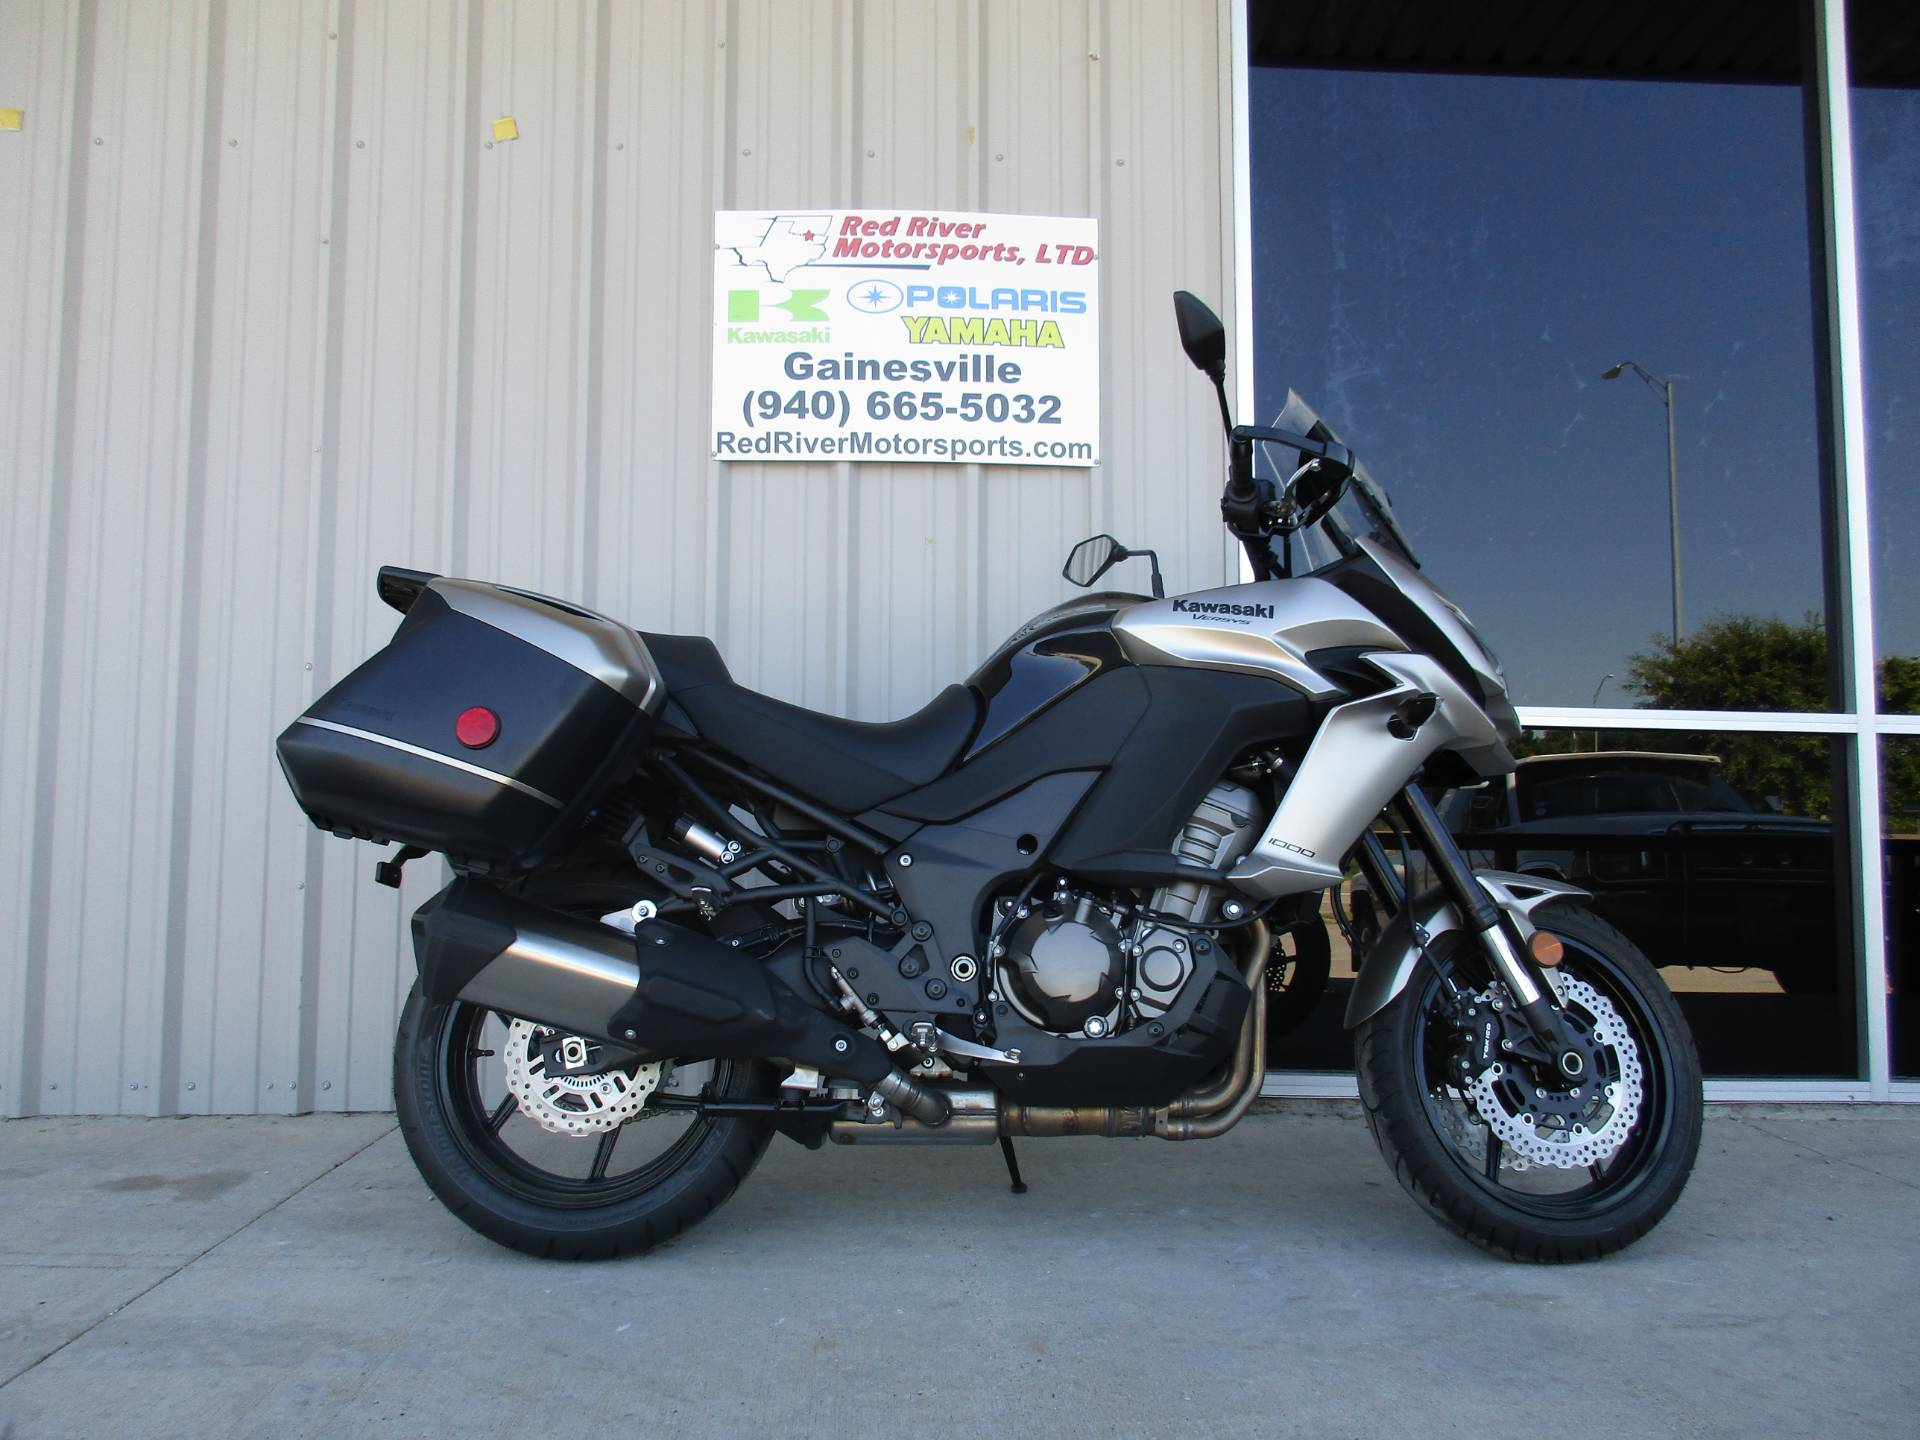 2016 Kawasaki Versys 1000 LT in Gainesville, Texas